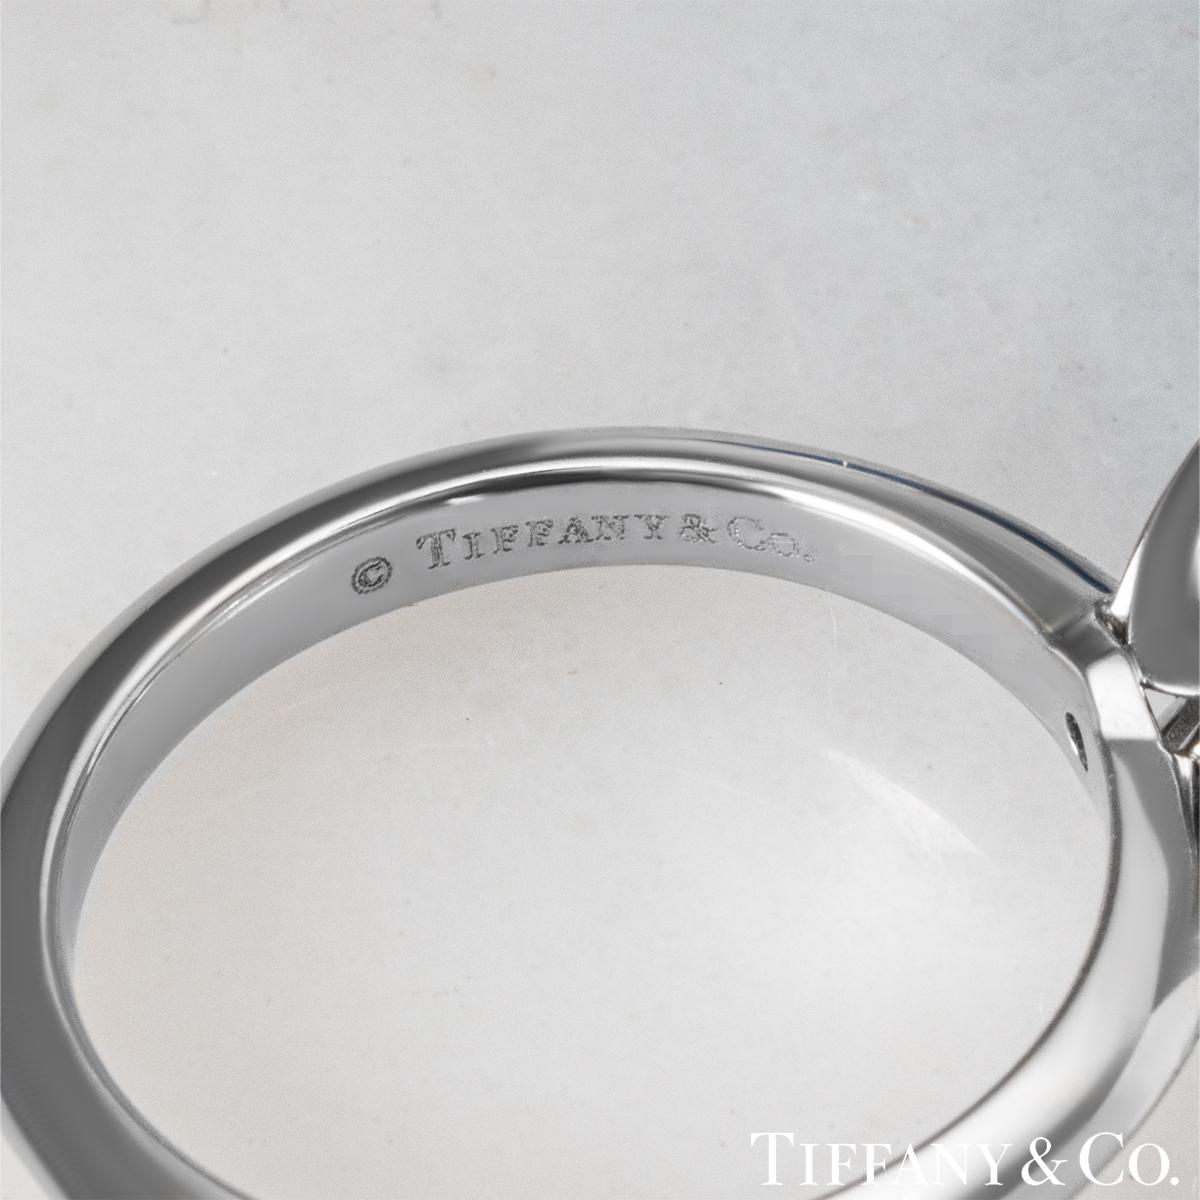 Tiffany & Co. Platinum Princess Cut Diamond Ring 2.04ct F/VS1 XXX